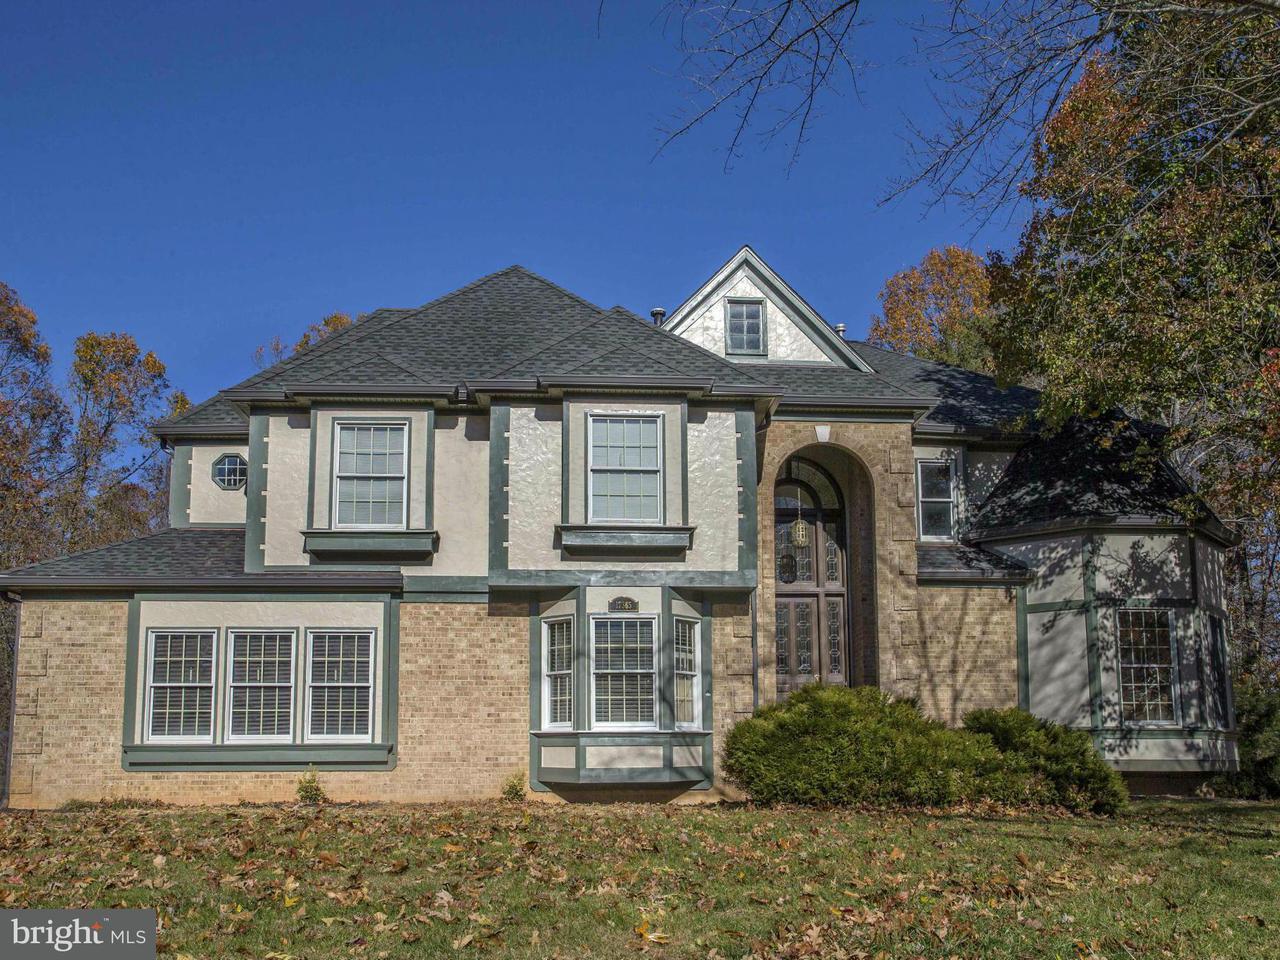 Single Family Home for Sale at 17365 Berkshire Drive 17365 Berkshire Drive Jeffersonton, Virginia 22724 United States